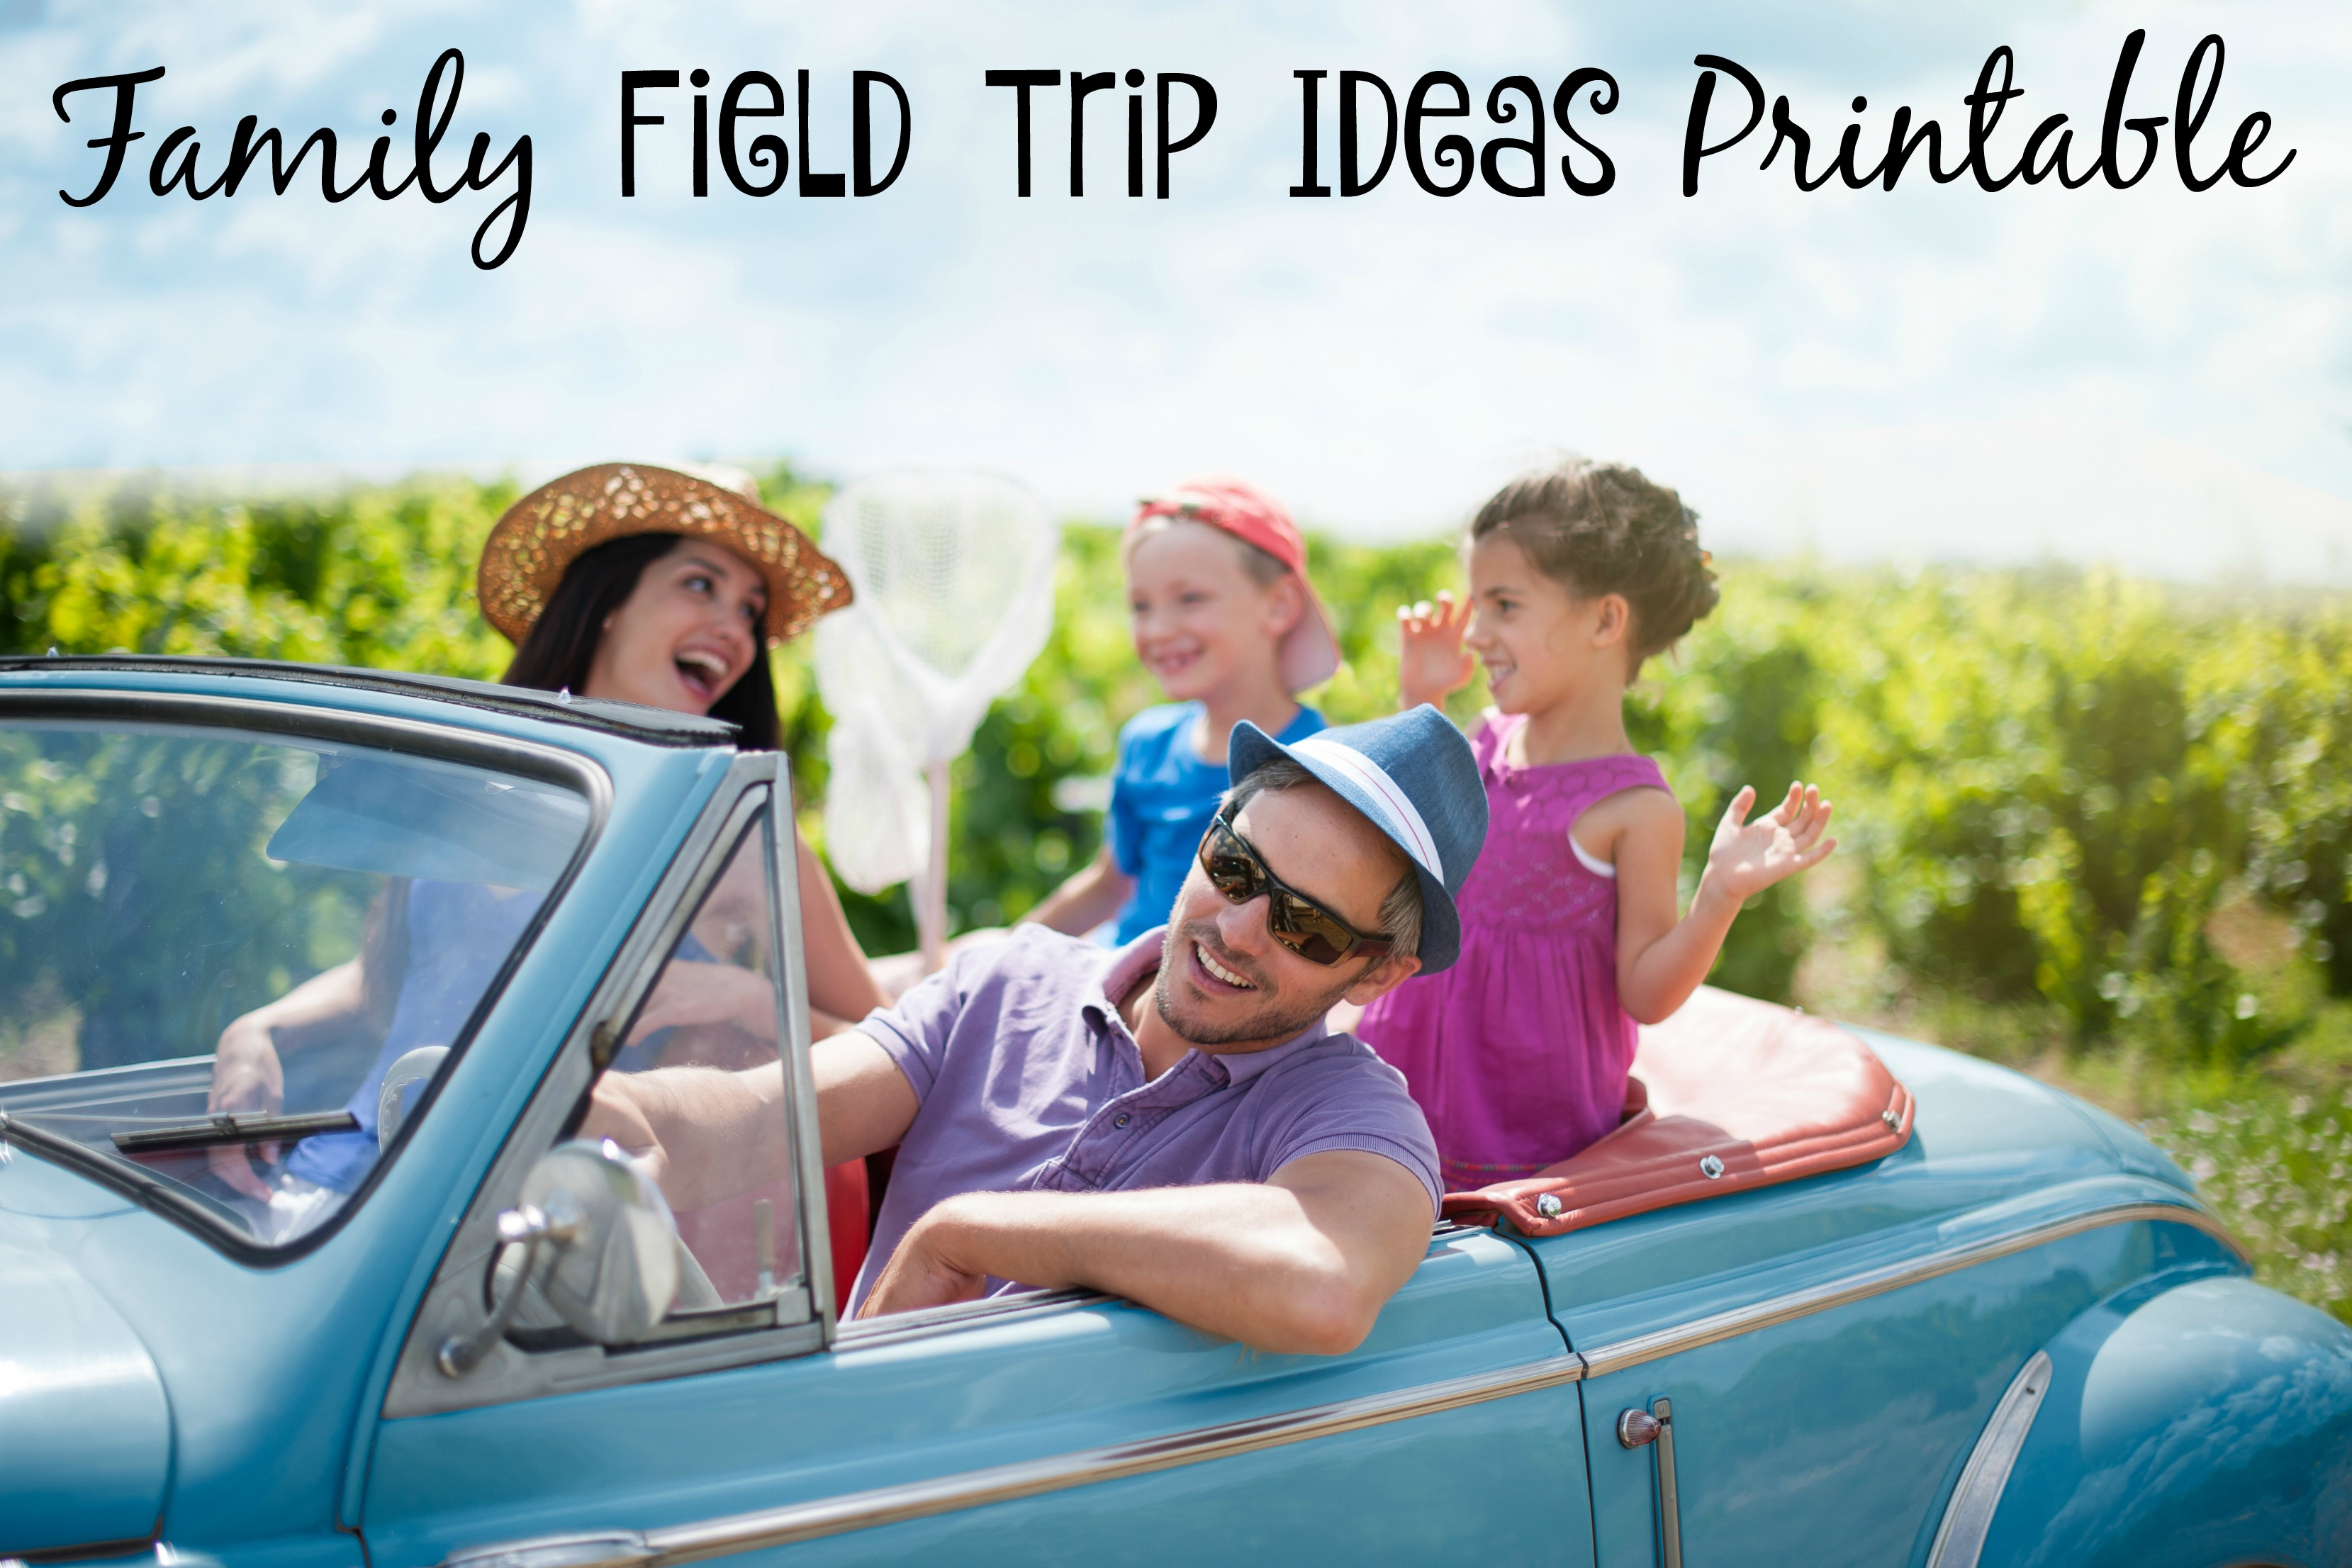 HHM Family Field Trip Ideas